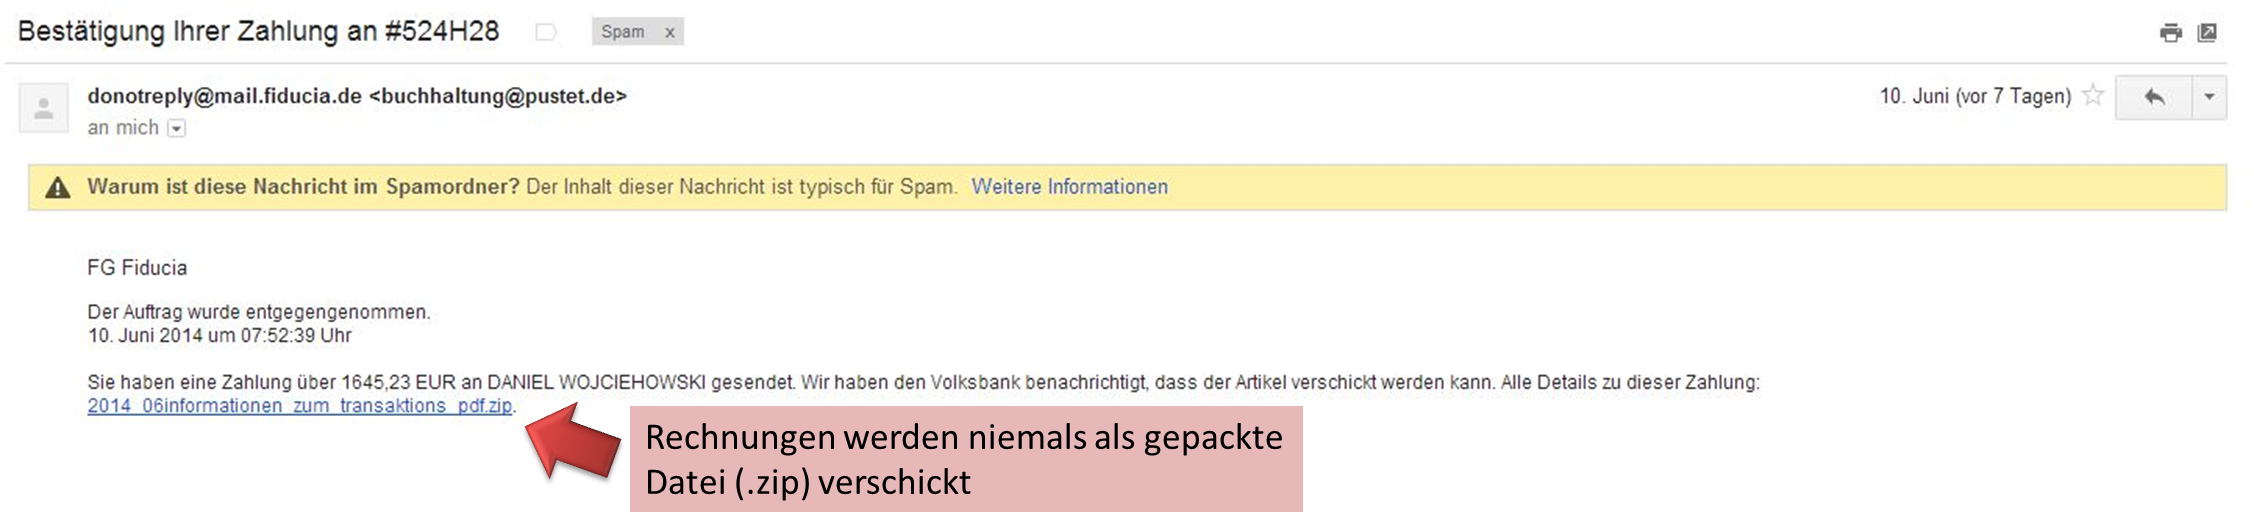 Rechnung2-Phishing-Mail